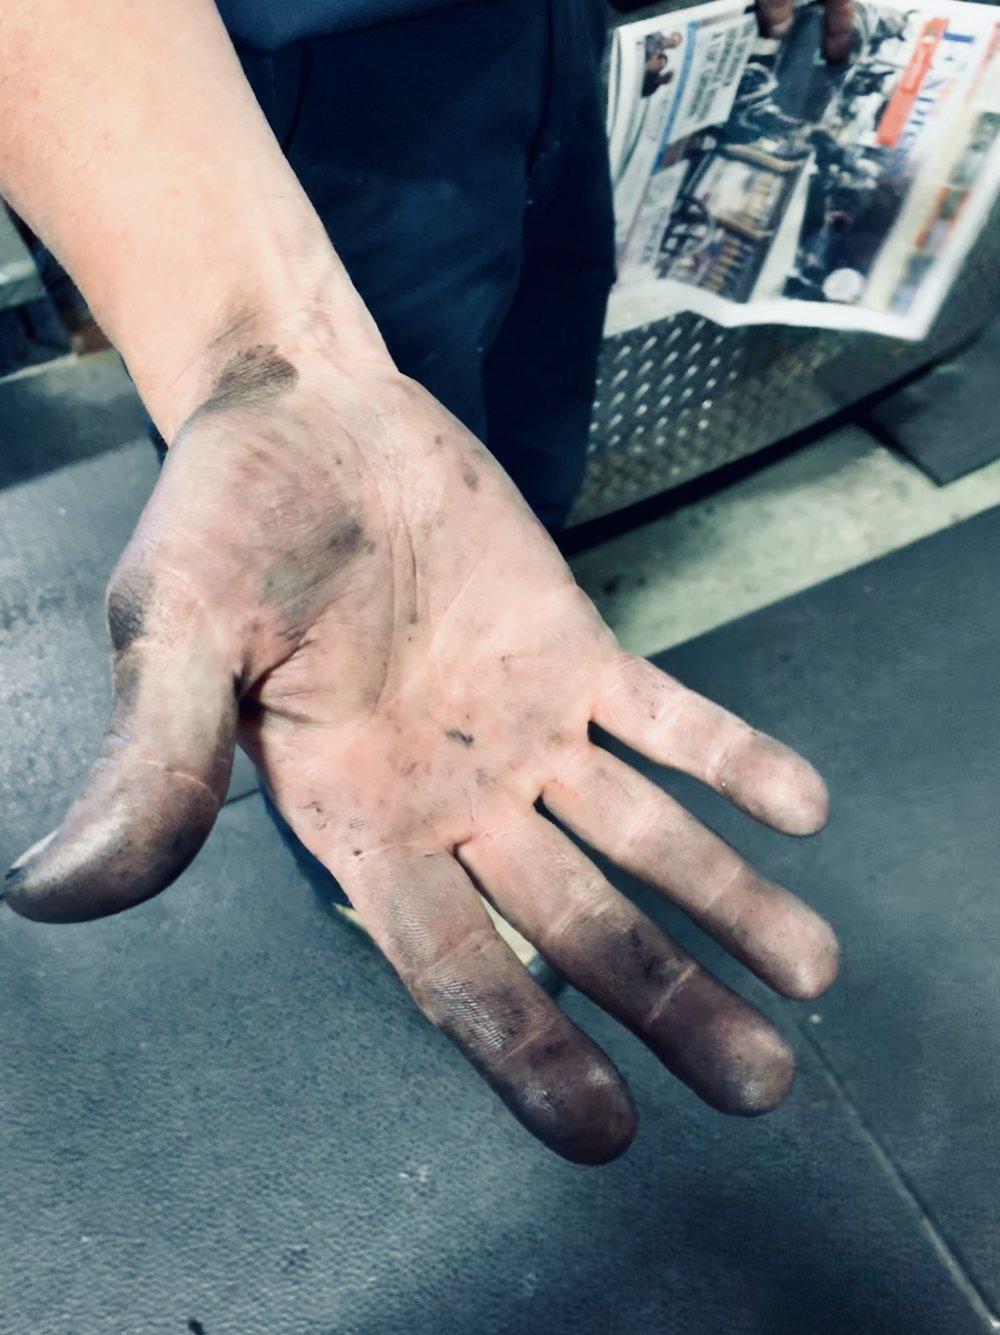 Keith adjusts ink